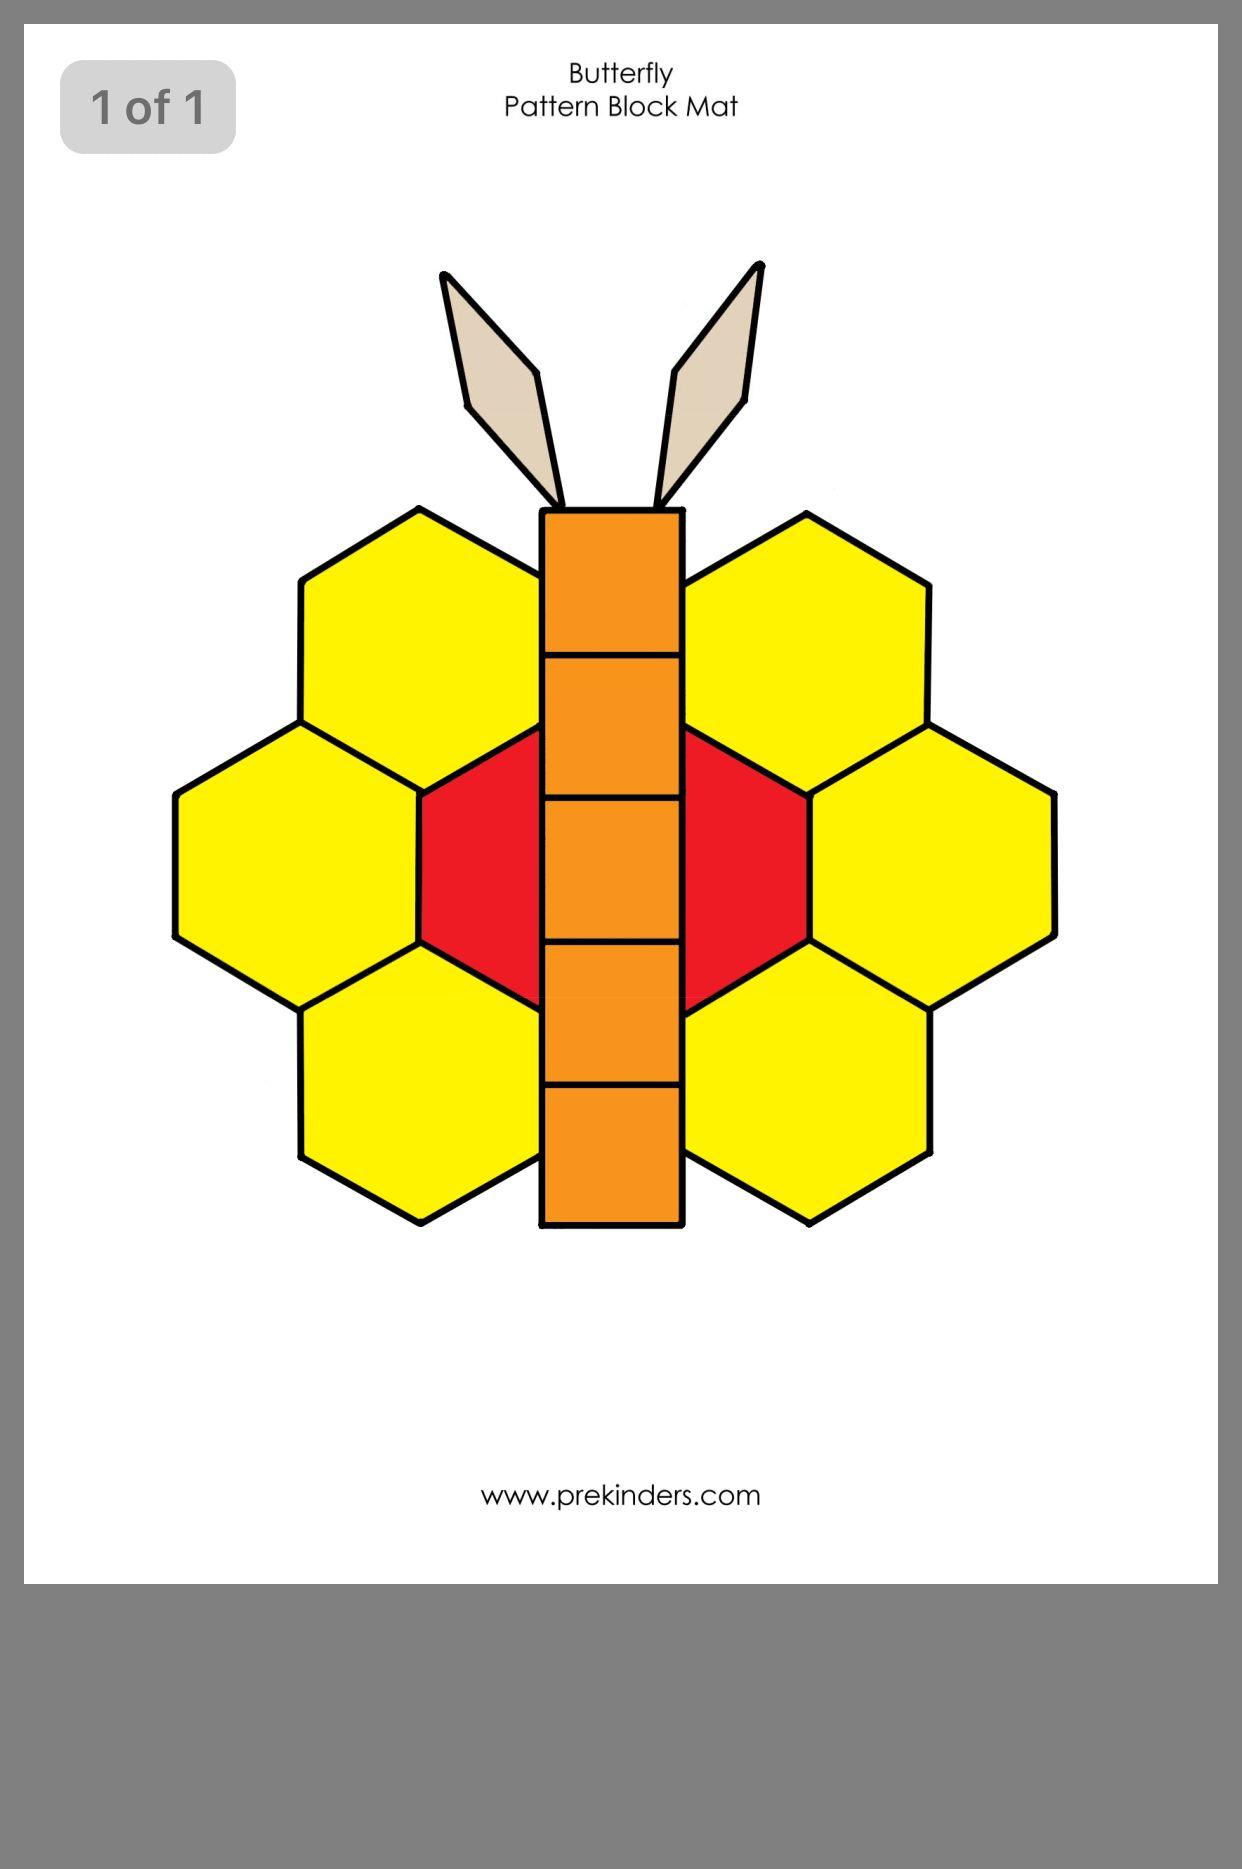 Pin By Amanda Zullo On Preschool Block Patterns Pattern Block Printables Preschool Patterns Christmas Math Games [ 1869 x 1242 Pixel ]